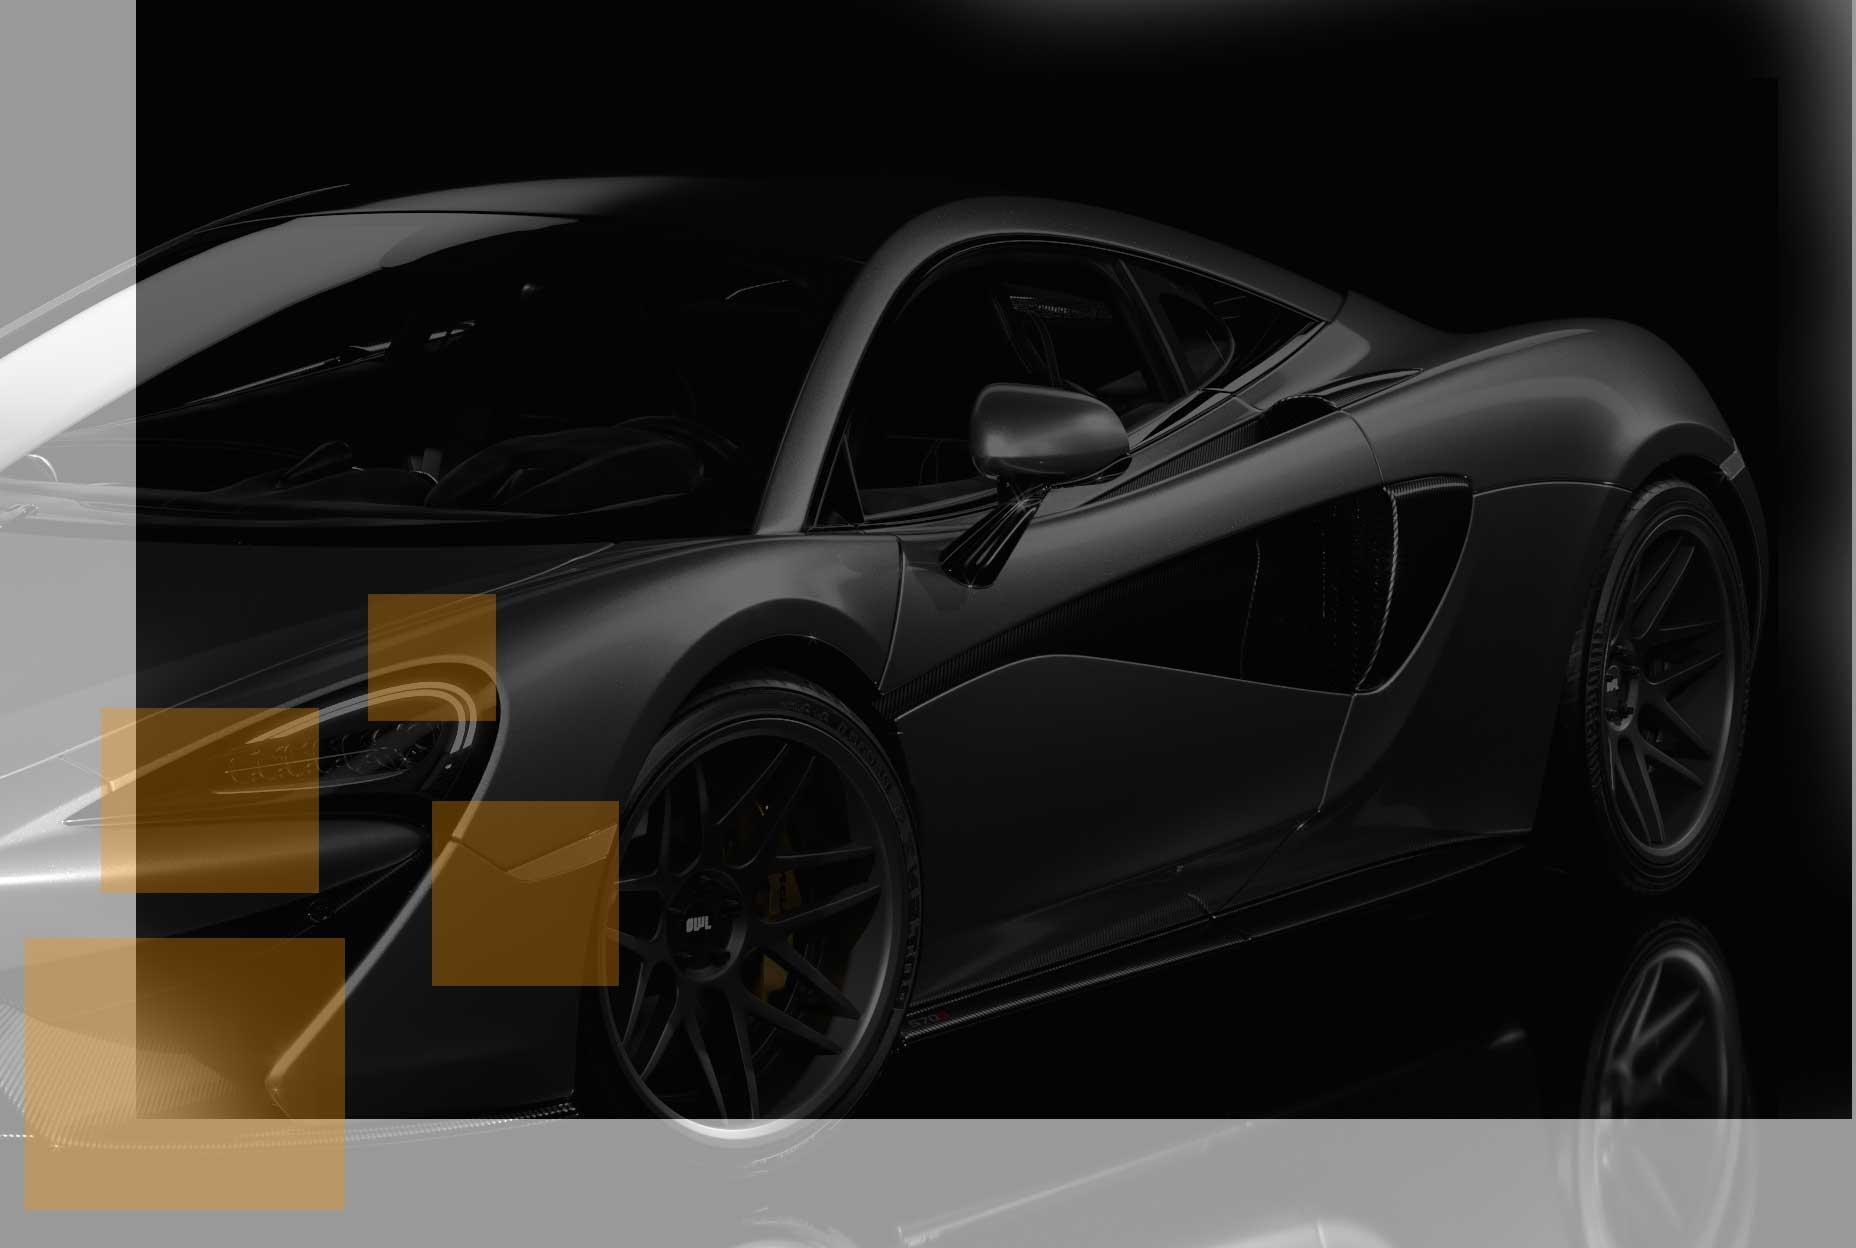 modeling using polygons car 3ds max mayaa3 - مدلسازی خودرو در تری دی مکس